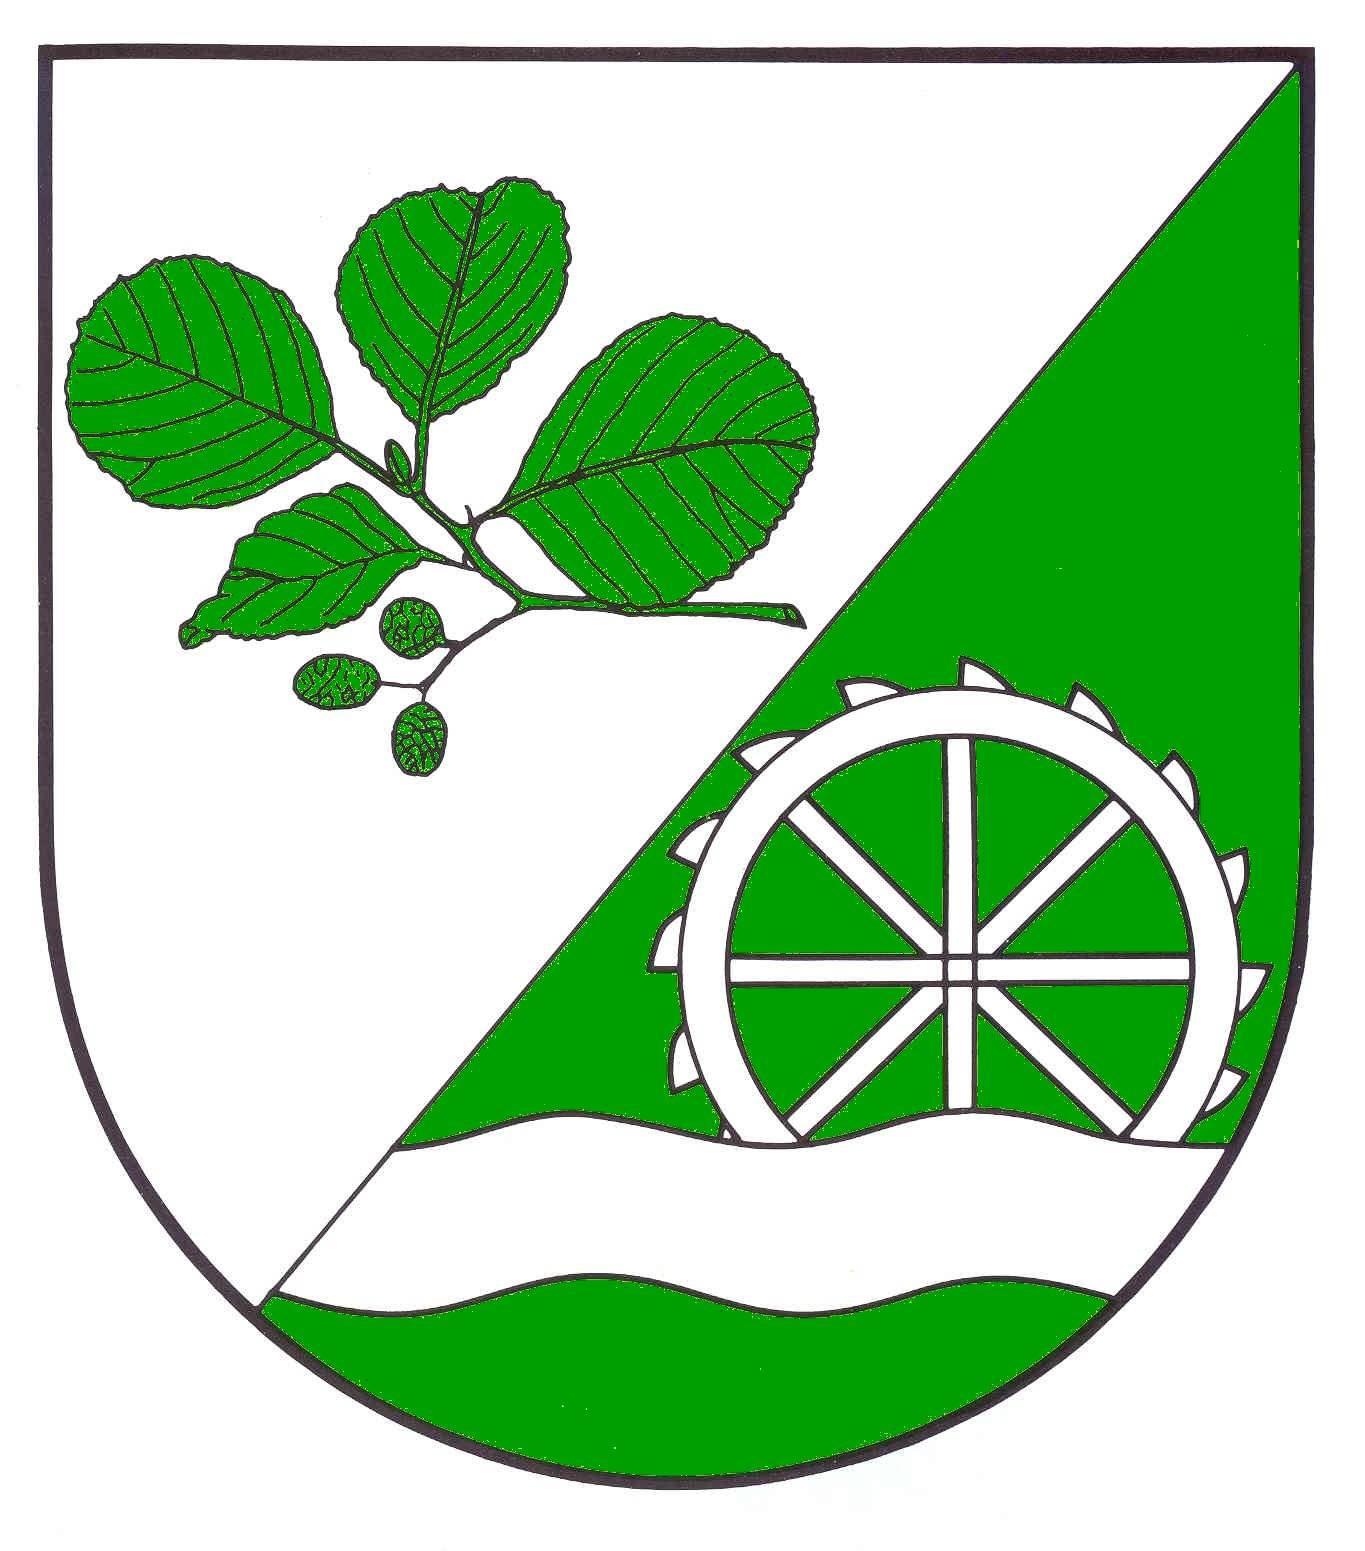 Wappen GemeindeElsdorf-Westermühlen, Kreis Rendsburg-Eckernförde